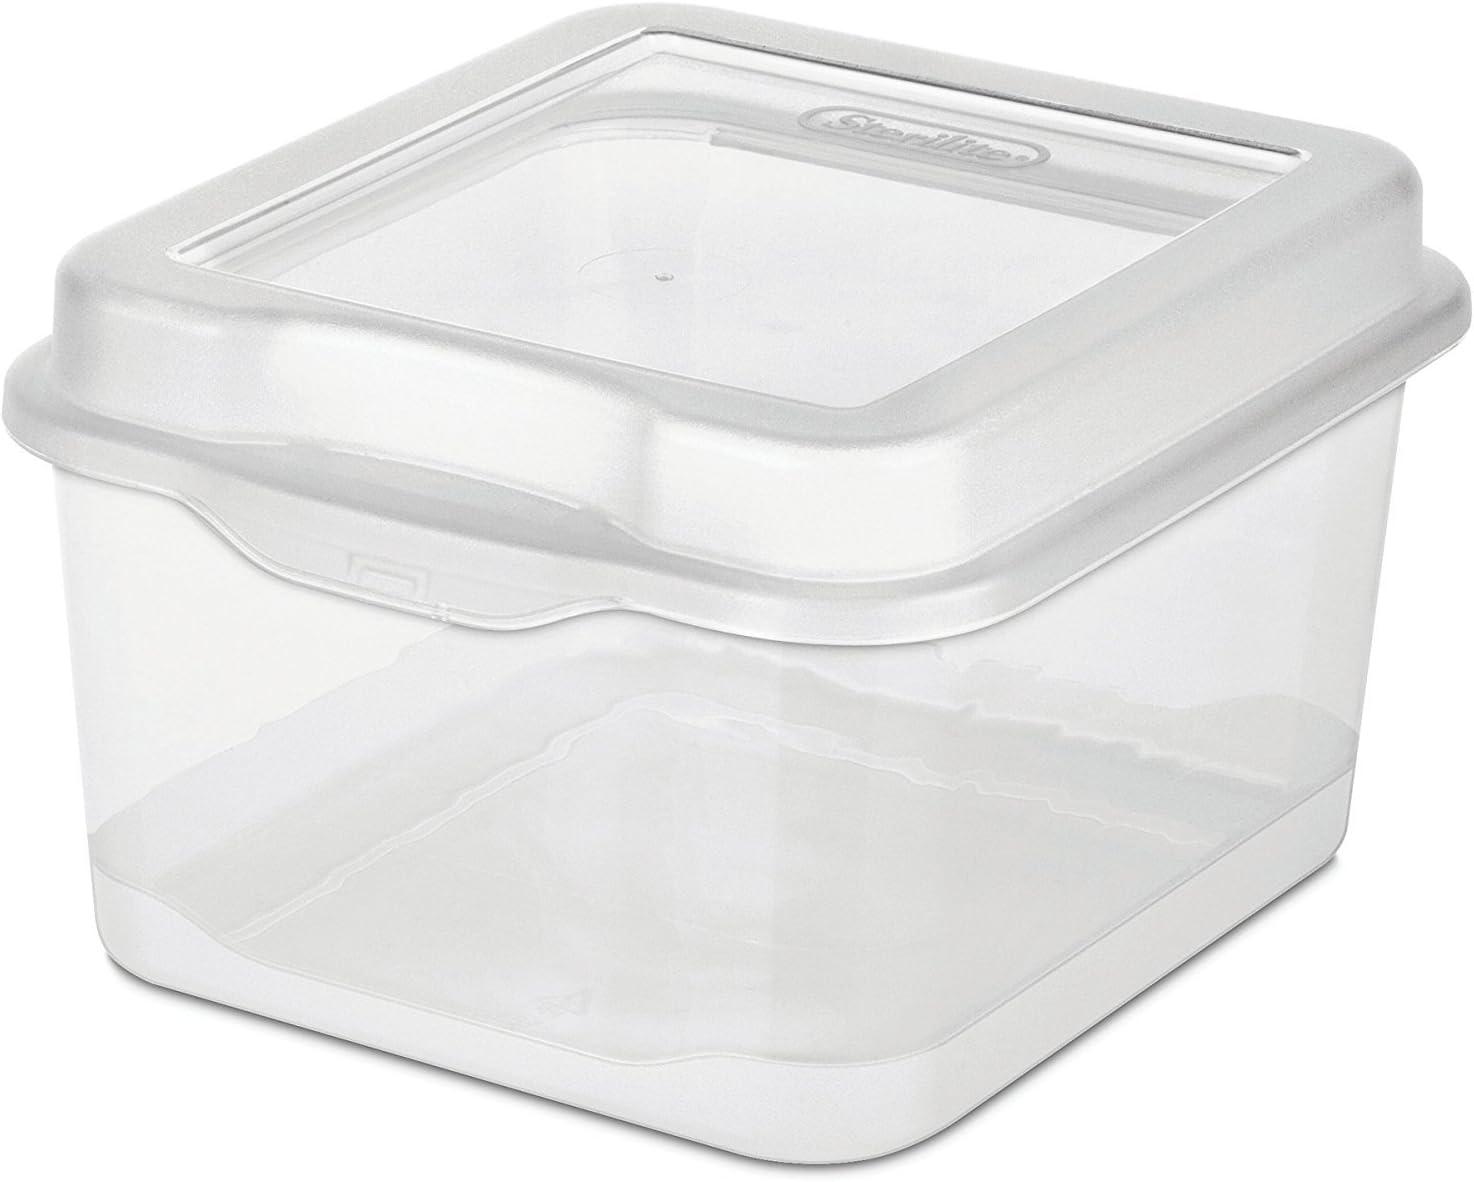 Sterilite Sales results No. 1 18038612 Small Clear Flip Box Storage Top Regular dealer